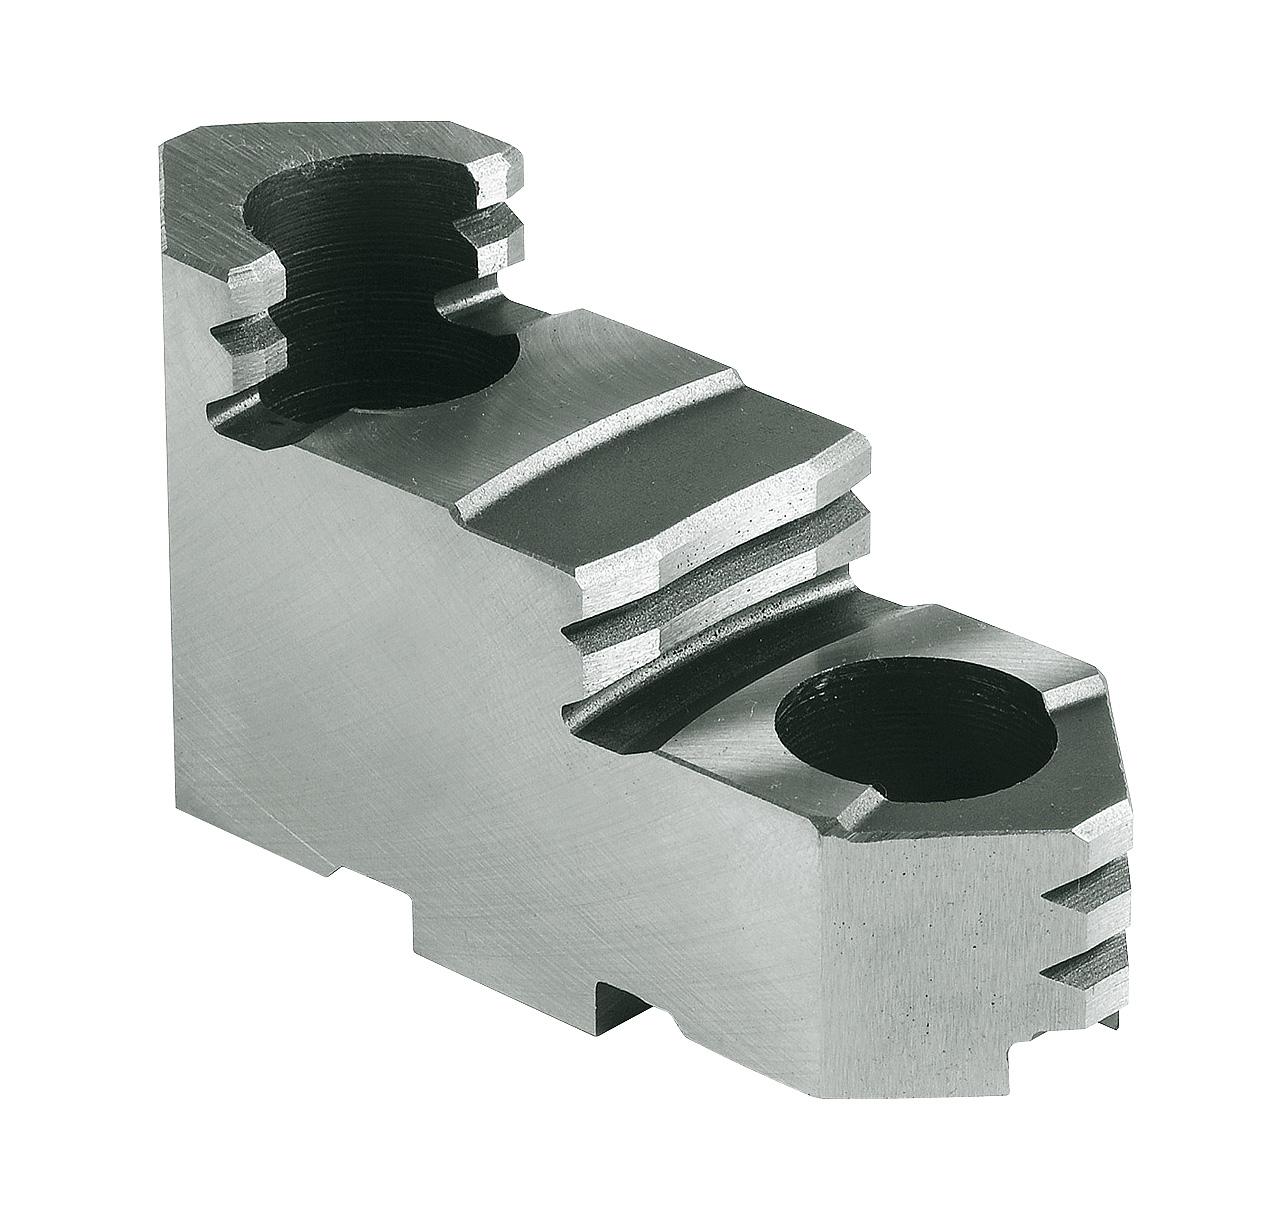 Szczęki górne twarde - komplet DTJ-DK12-250 BERNARDO